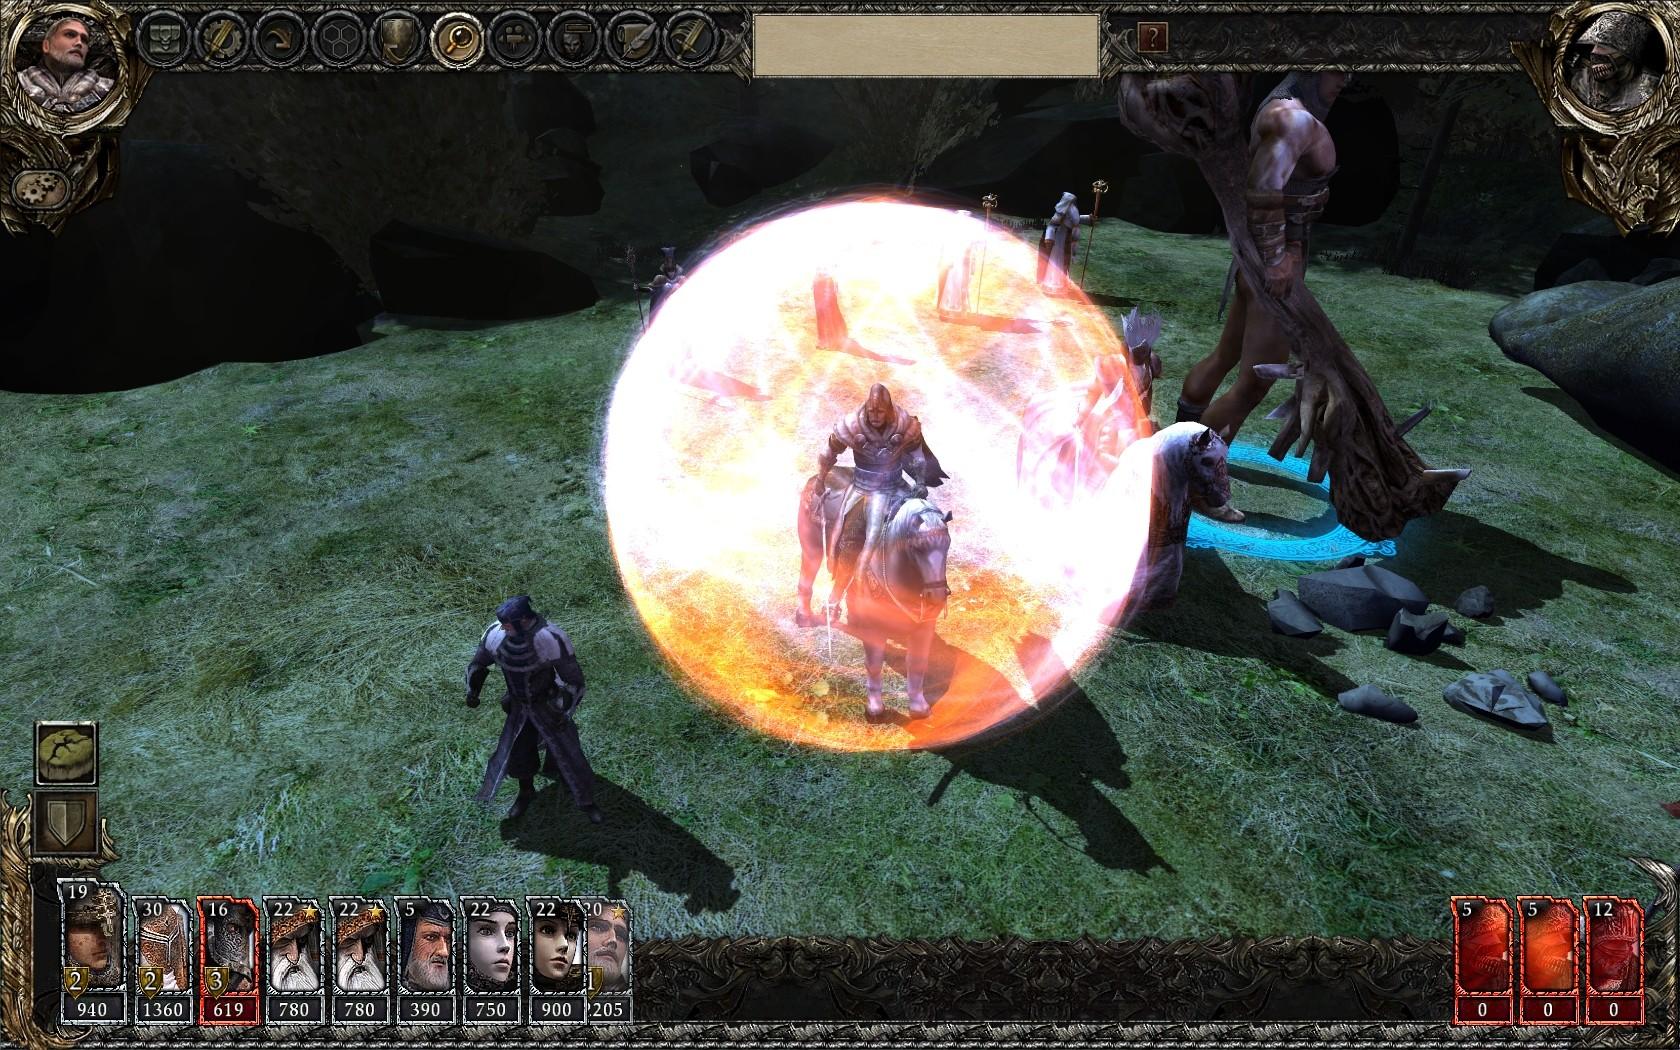 Disciples III - Renaissance Steam Special Edition screenshot